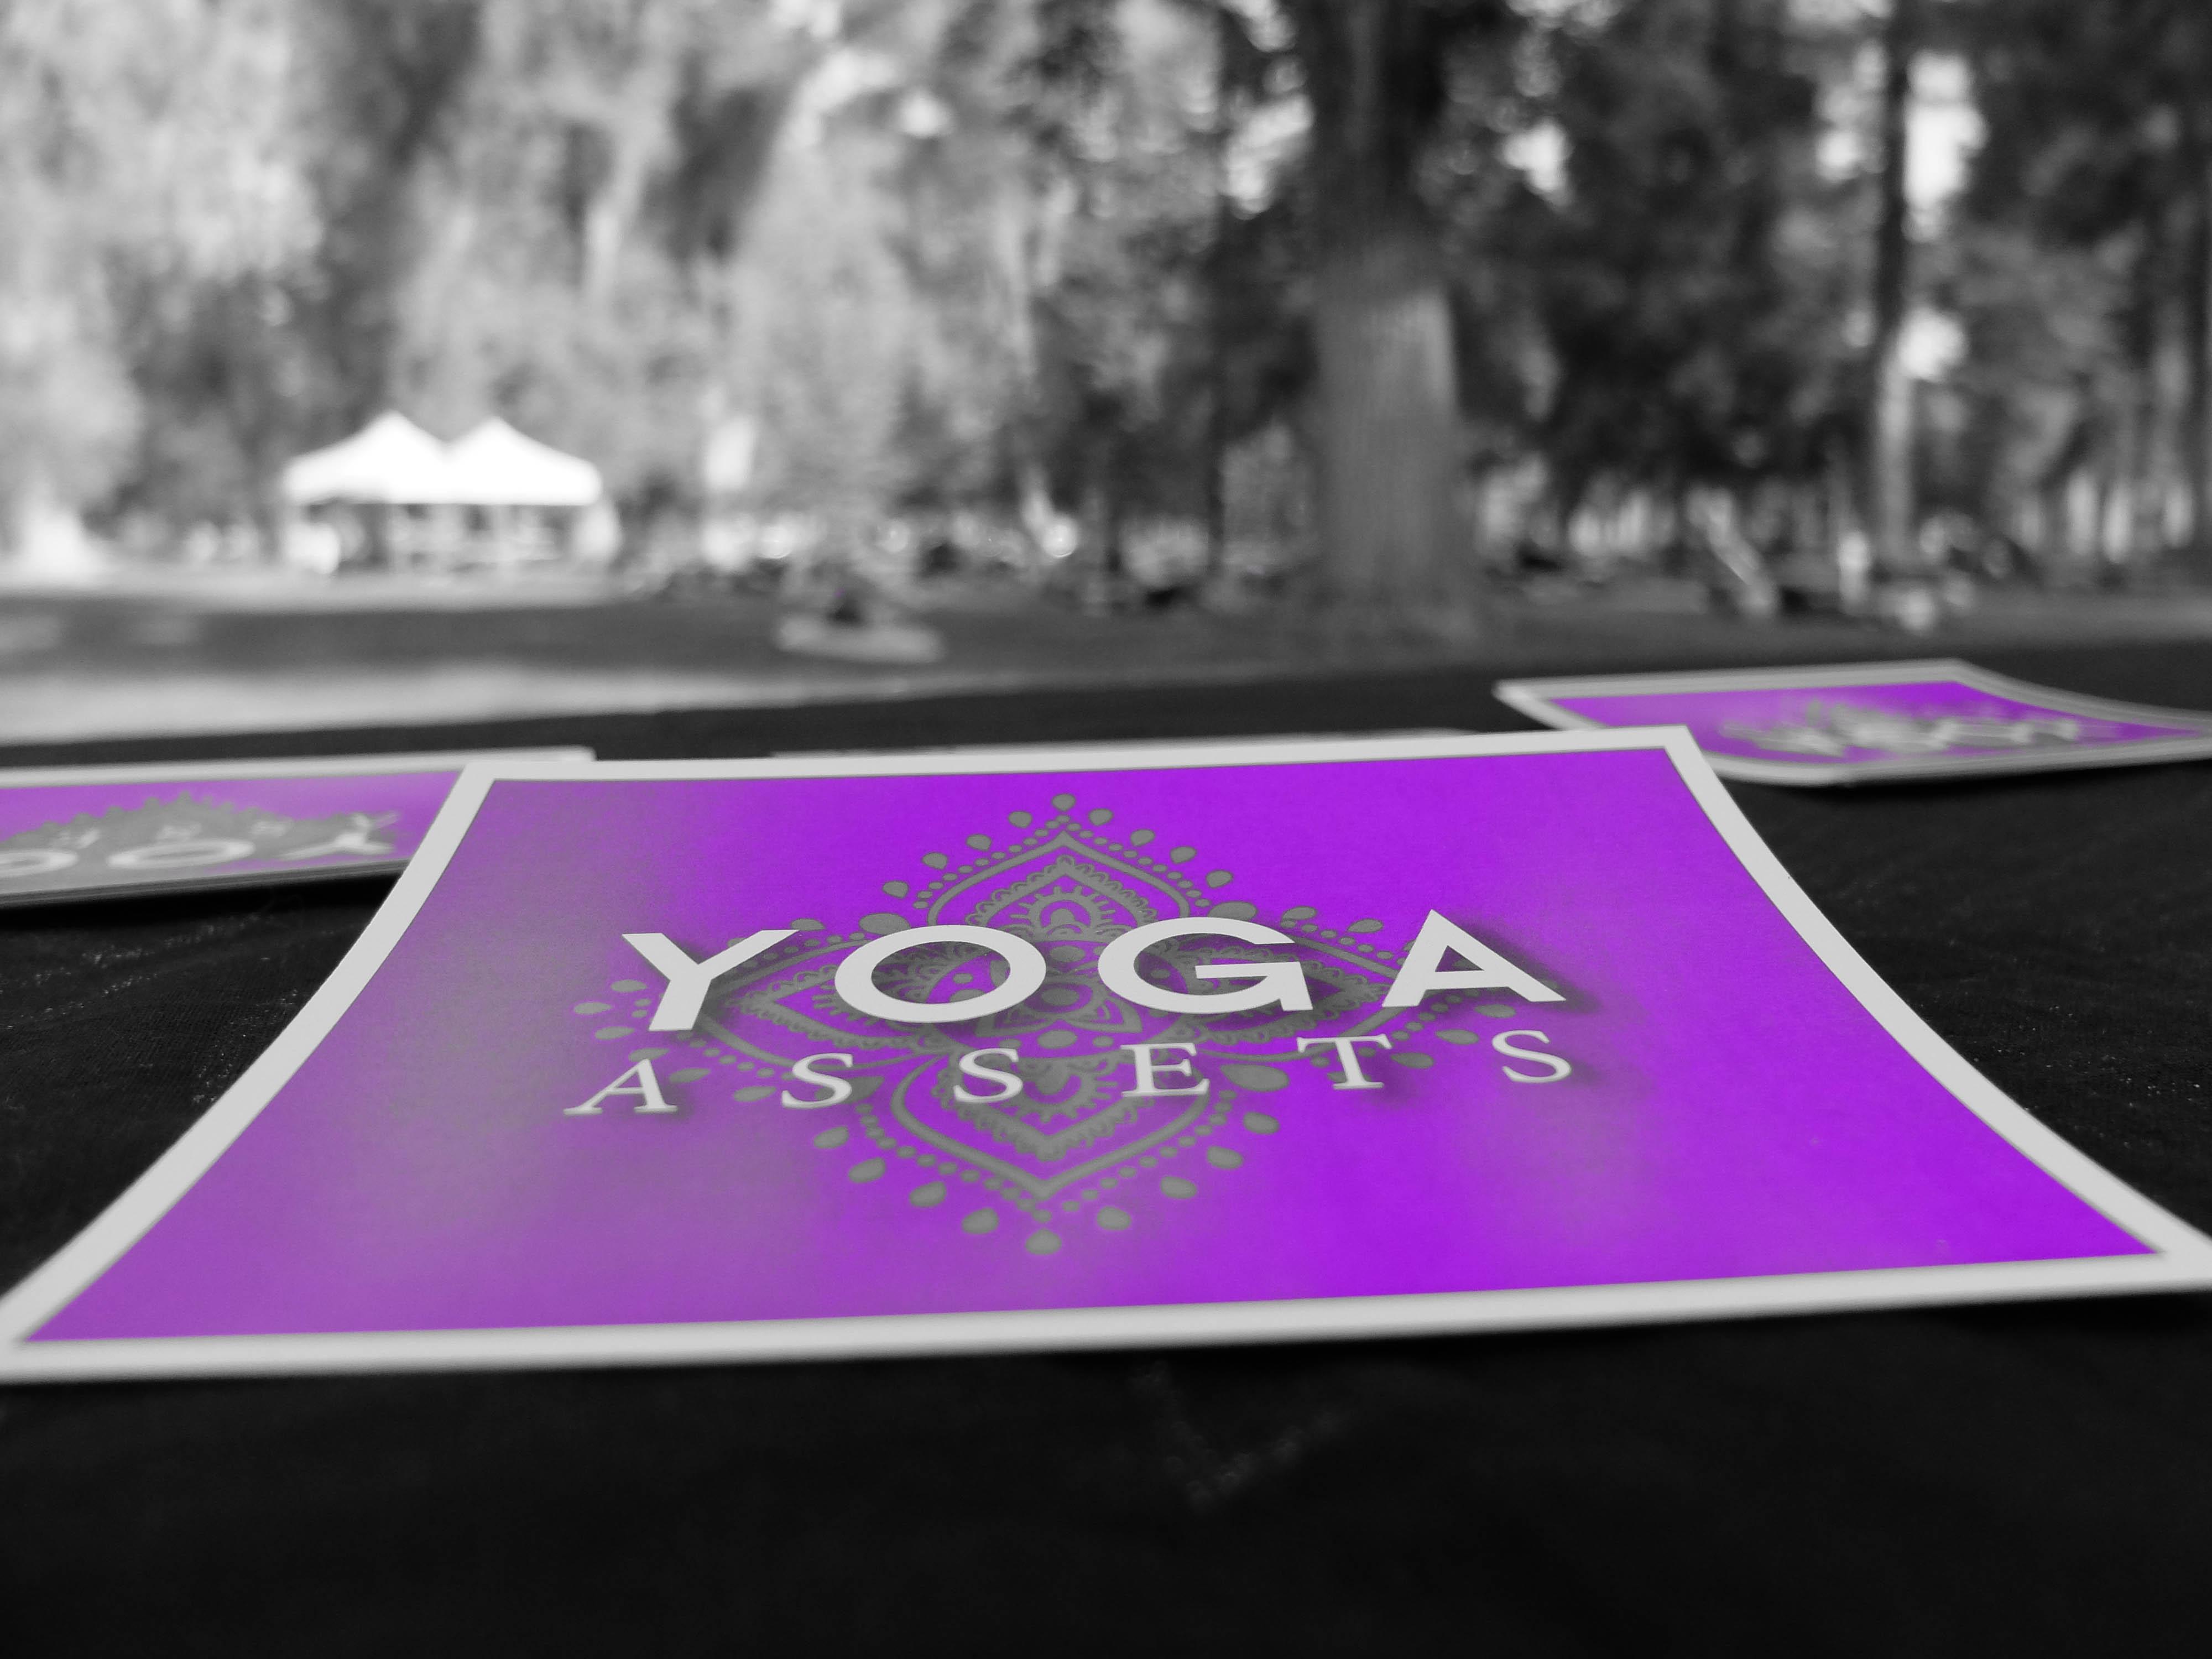 Yoga Assts Card (1 of 1)